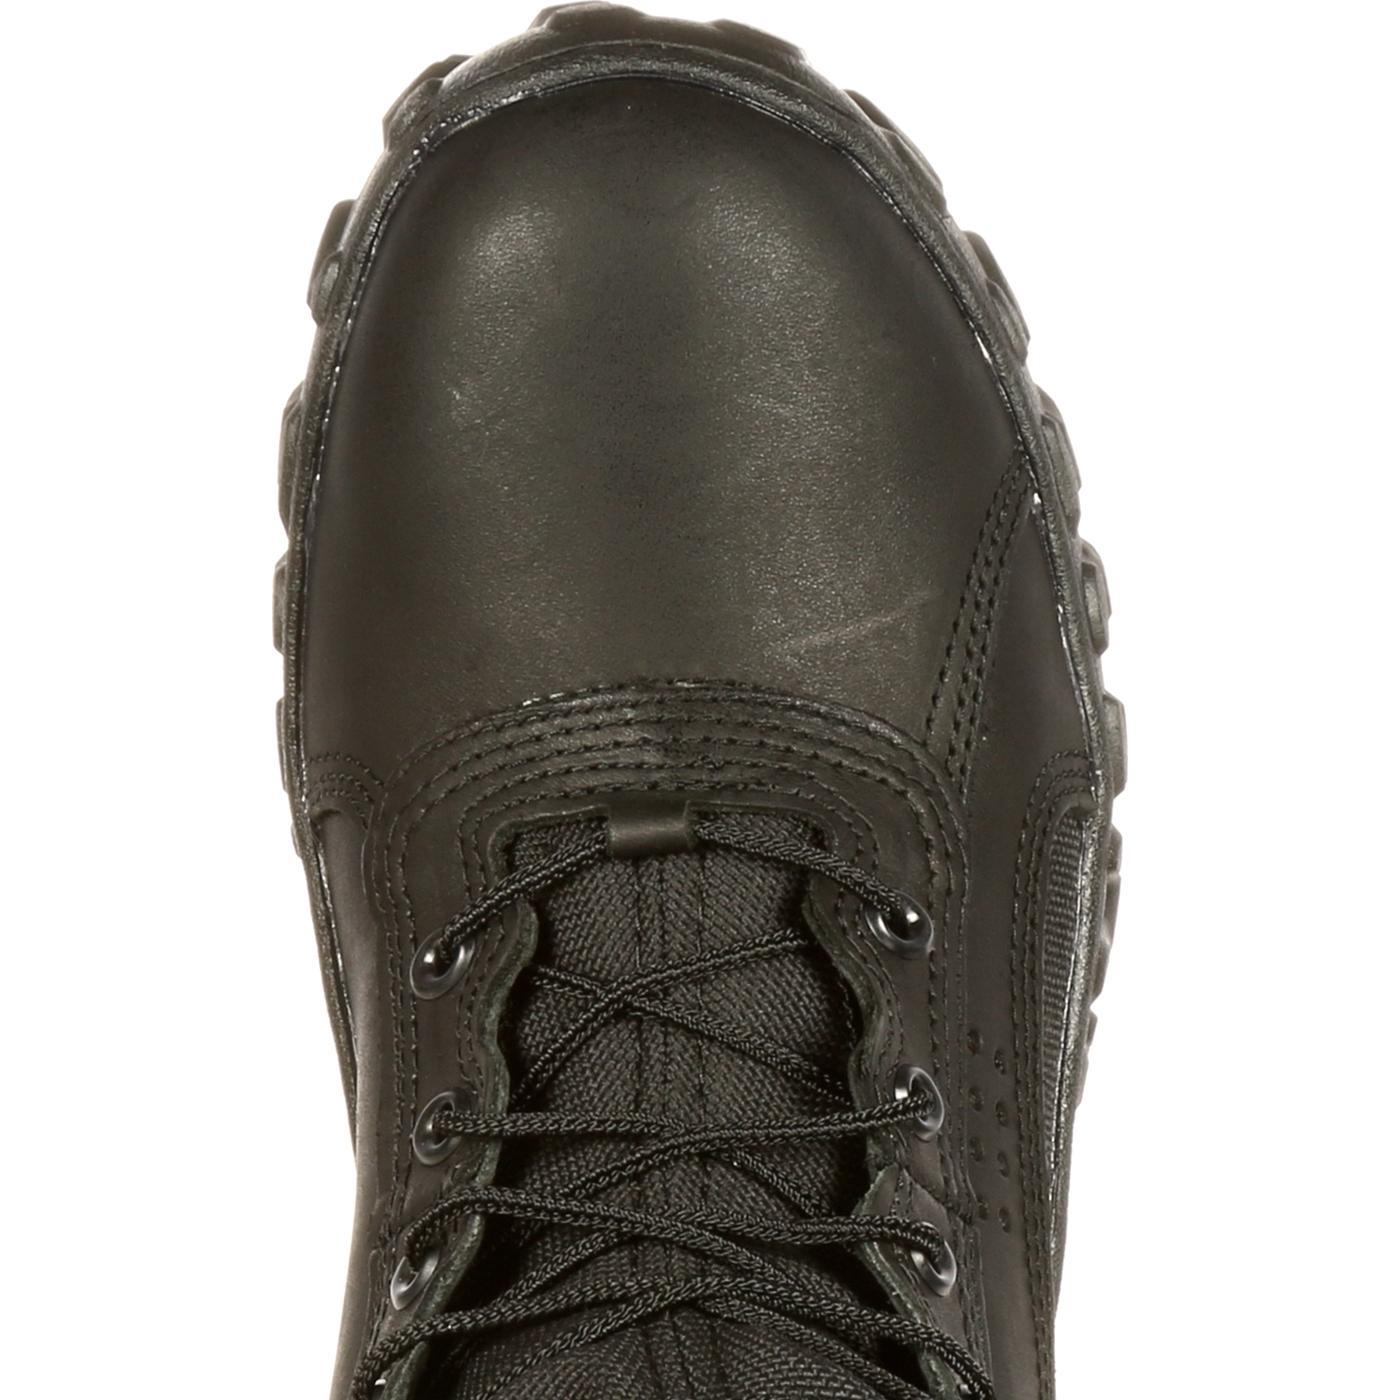 8eb37ffc94b Rocky S2V American-Made Black Military Boots